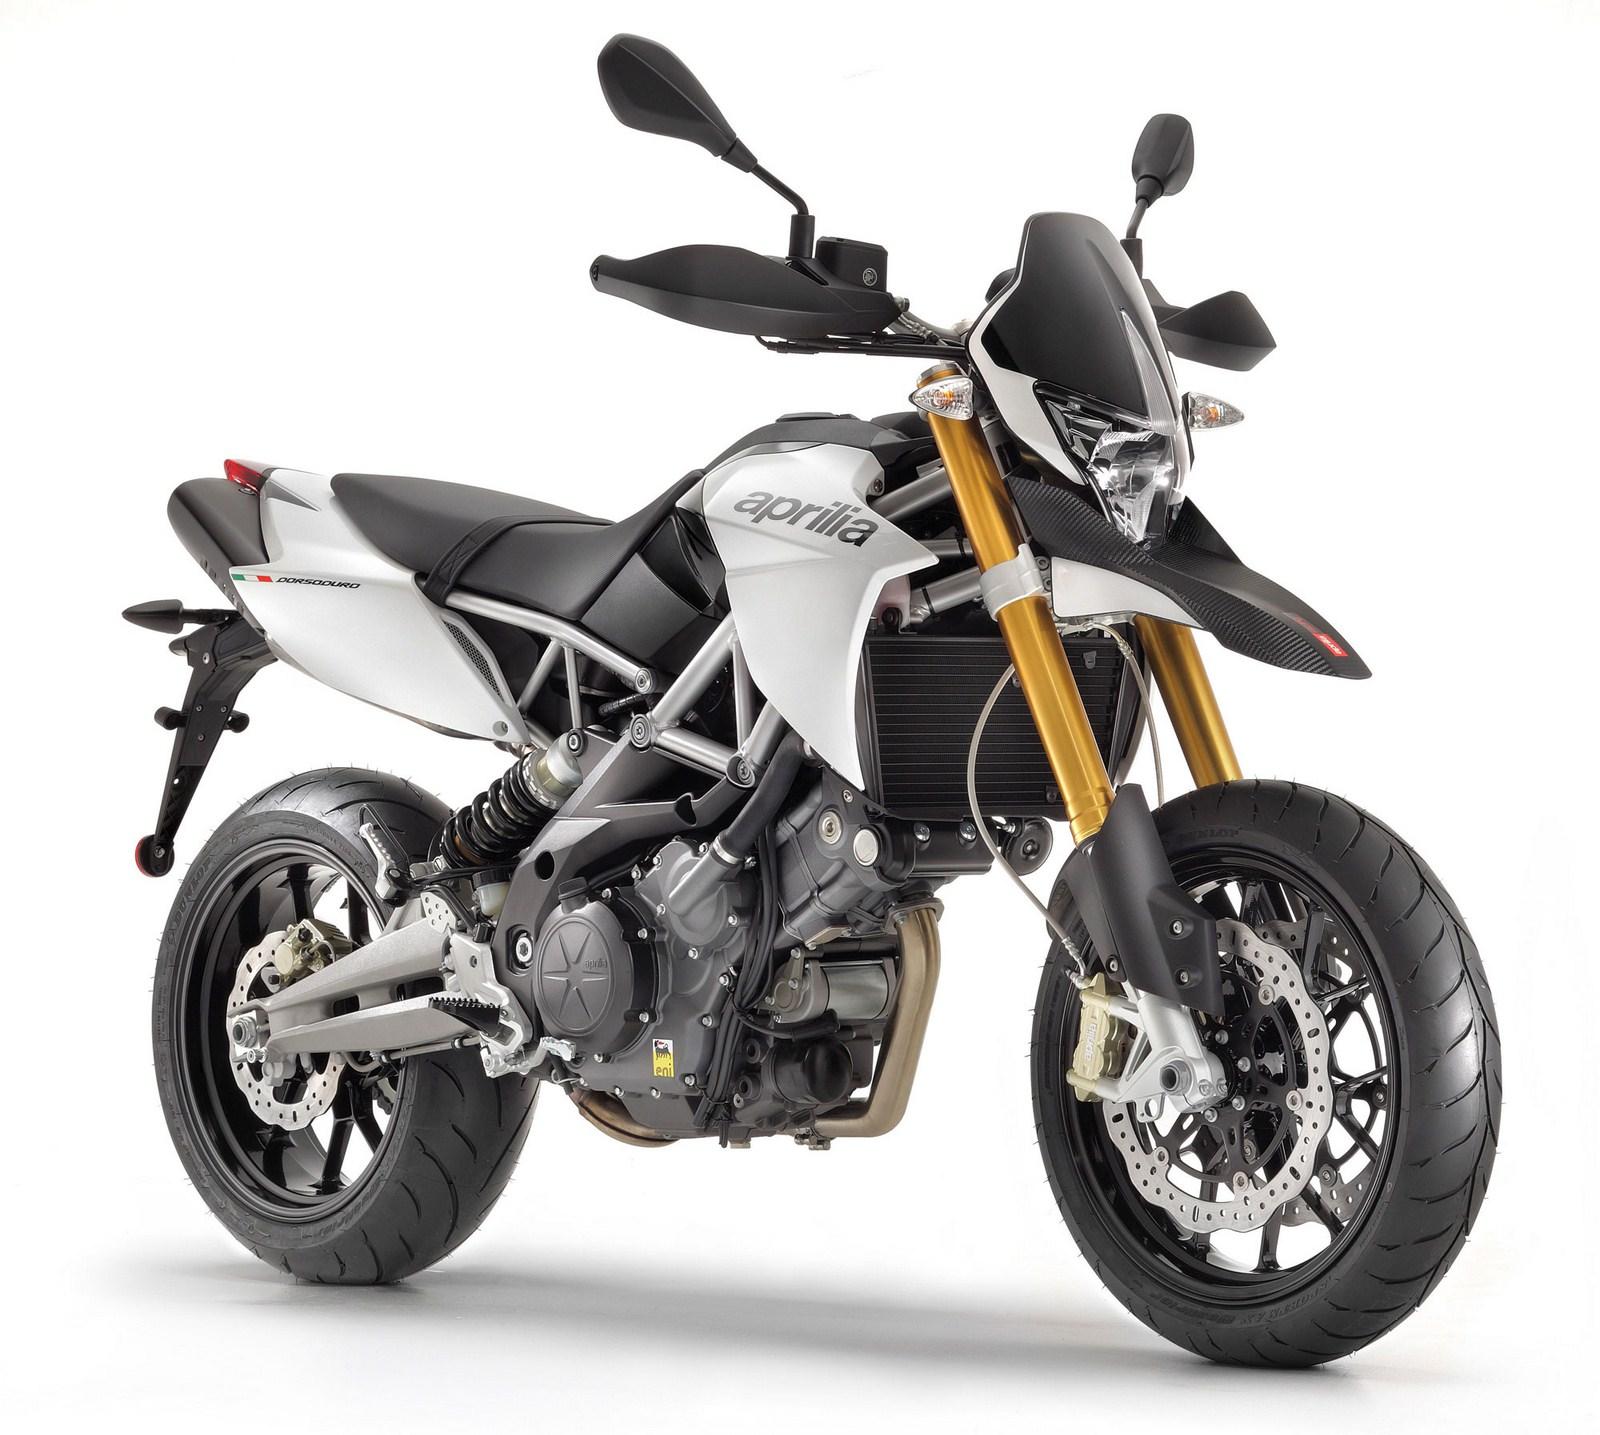 2013 aprilia dorsoduro 750 latest motorcycle models. Black Bedroom Furniture Sets. Home Design Ideas